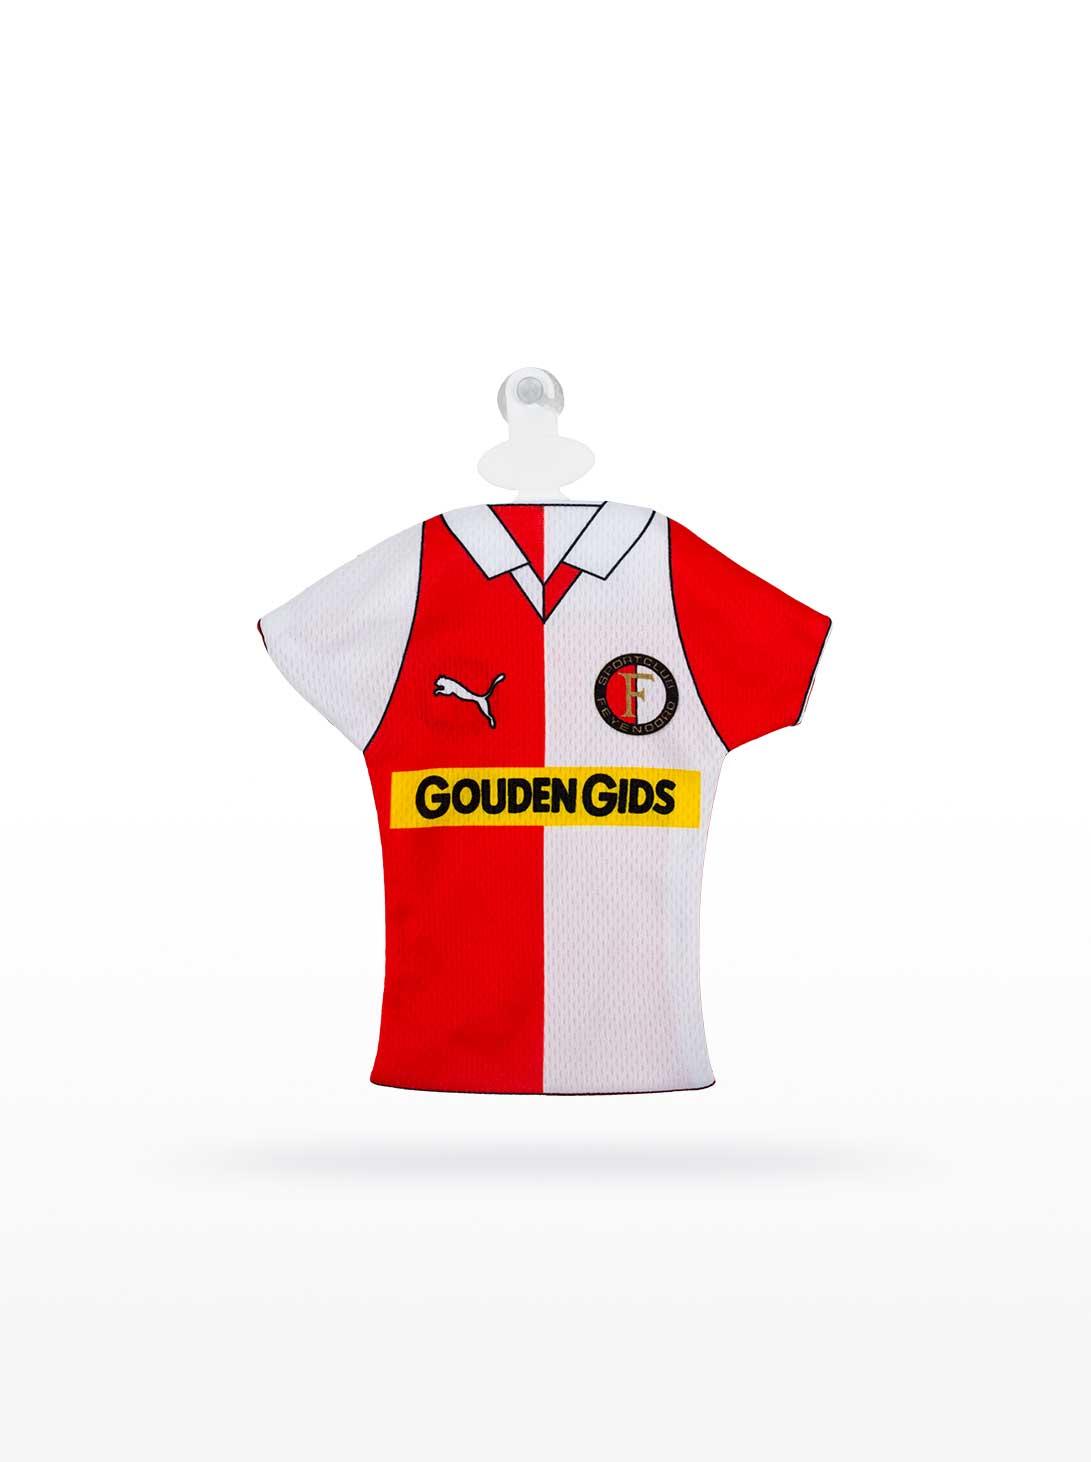 Feyenoord Minidress 1983-1984, Thuisshirt Gouden Gids